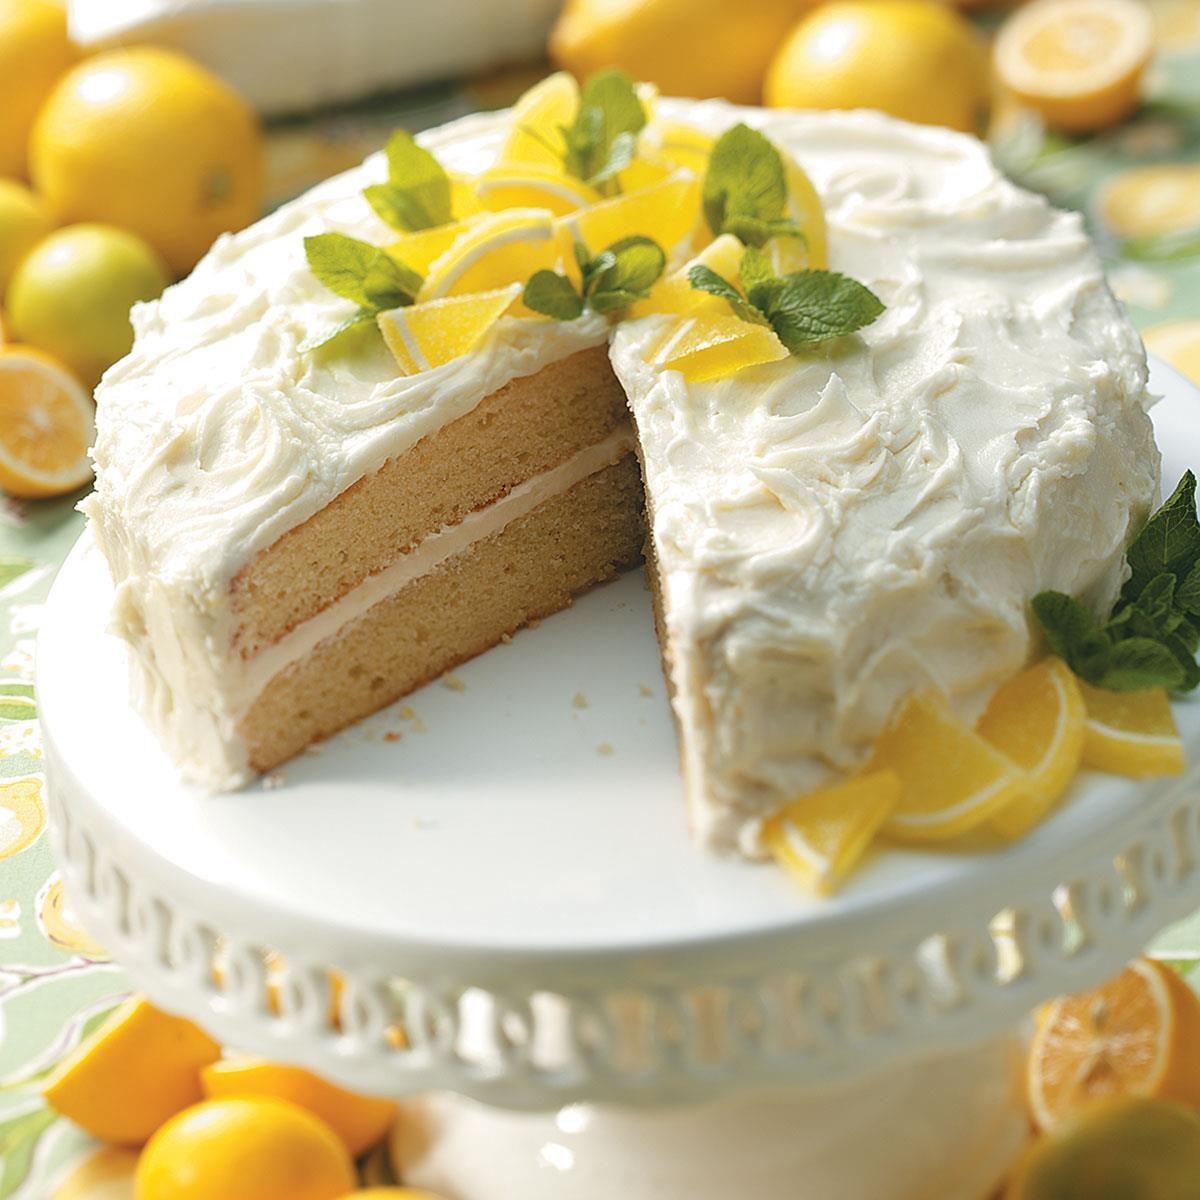 Rainbow Cake Recipe From Scratch